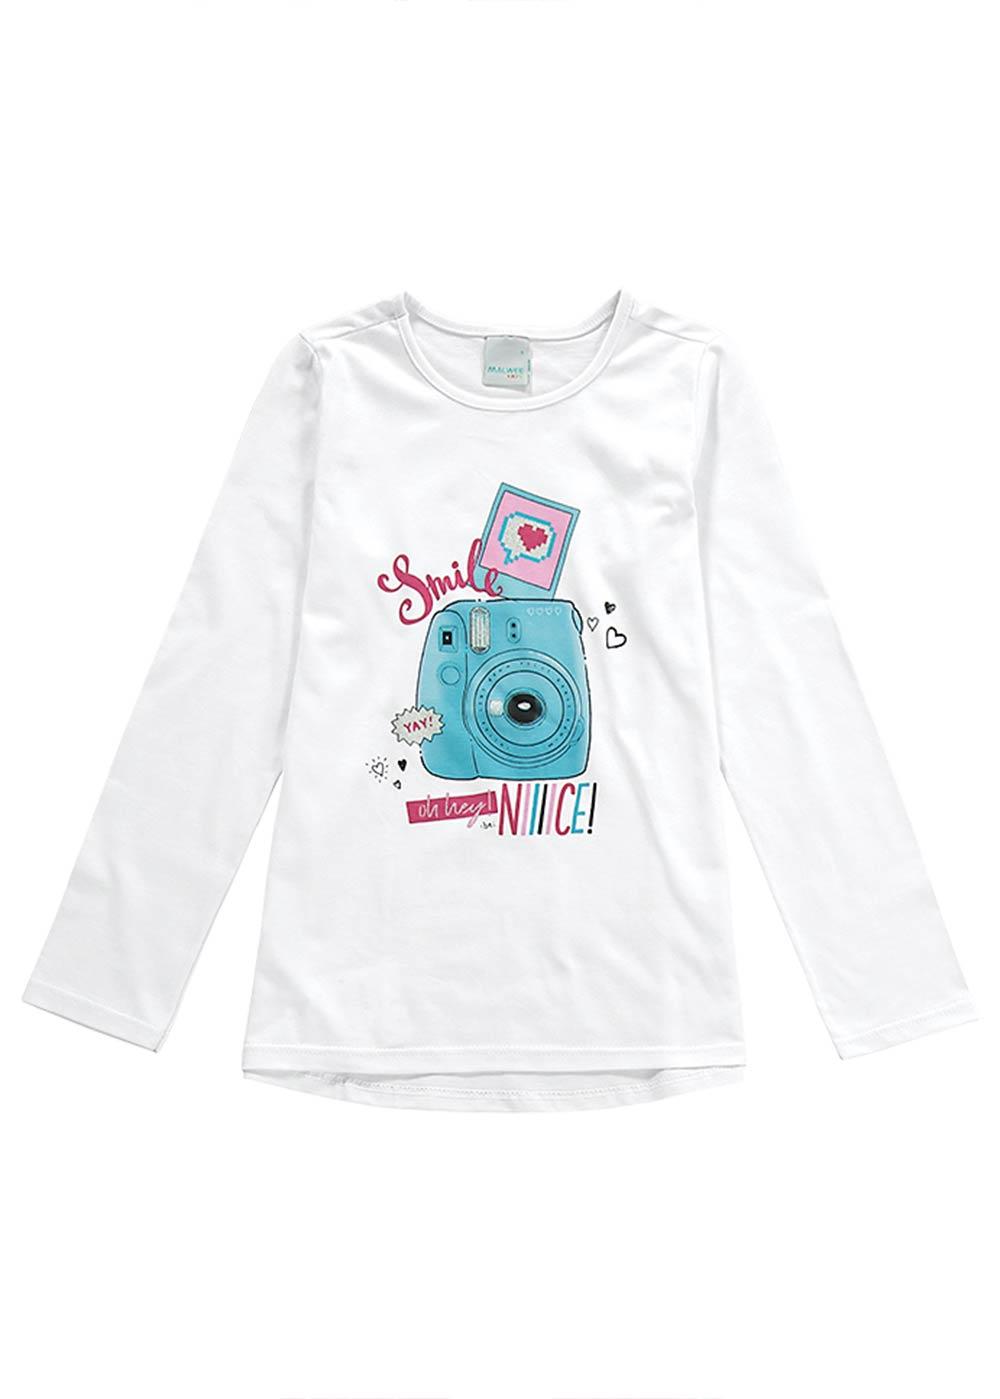 Blusa Infantil Feminina Inverno Kit 3 Peças Estampas Variadas - Malwee